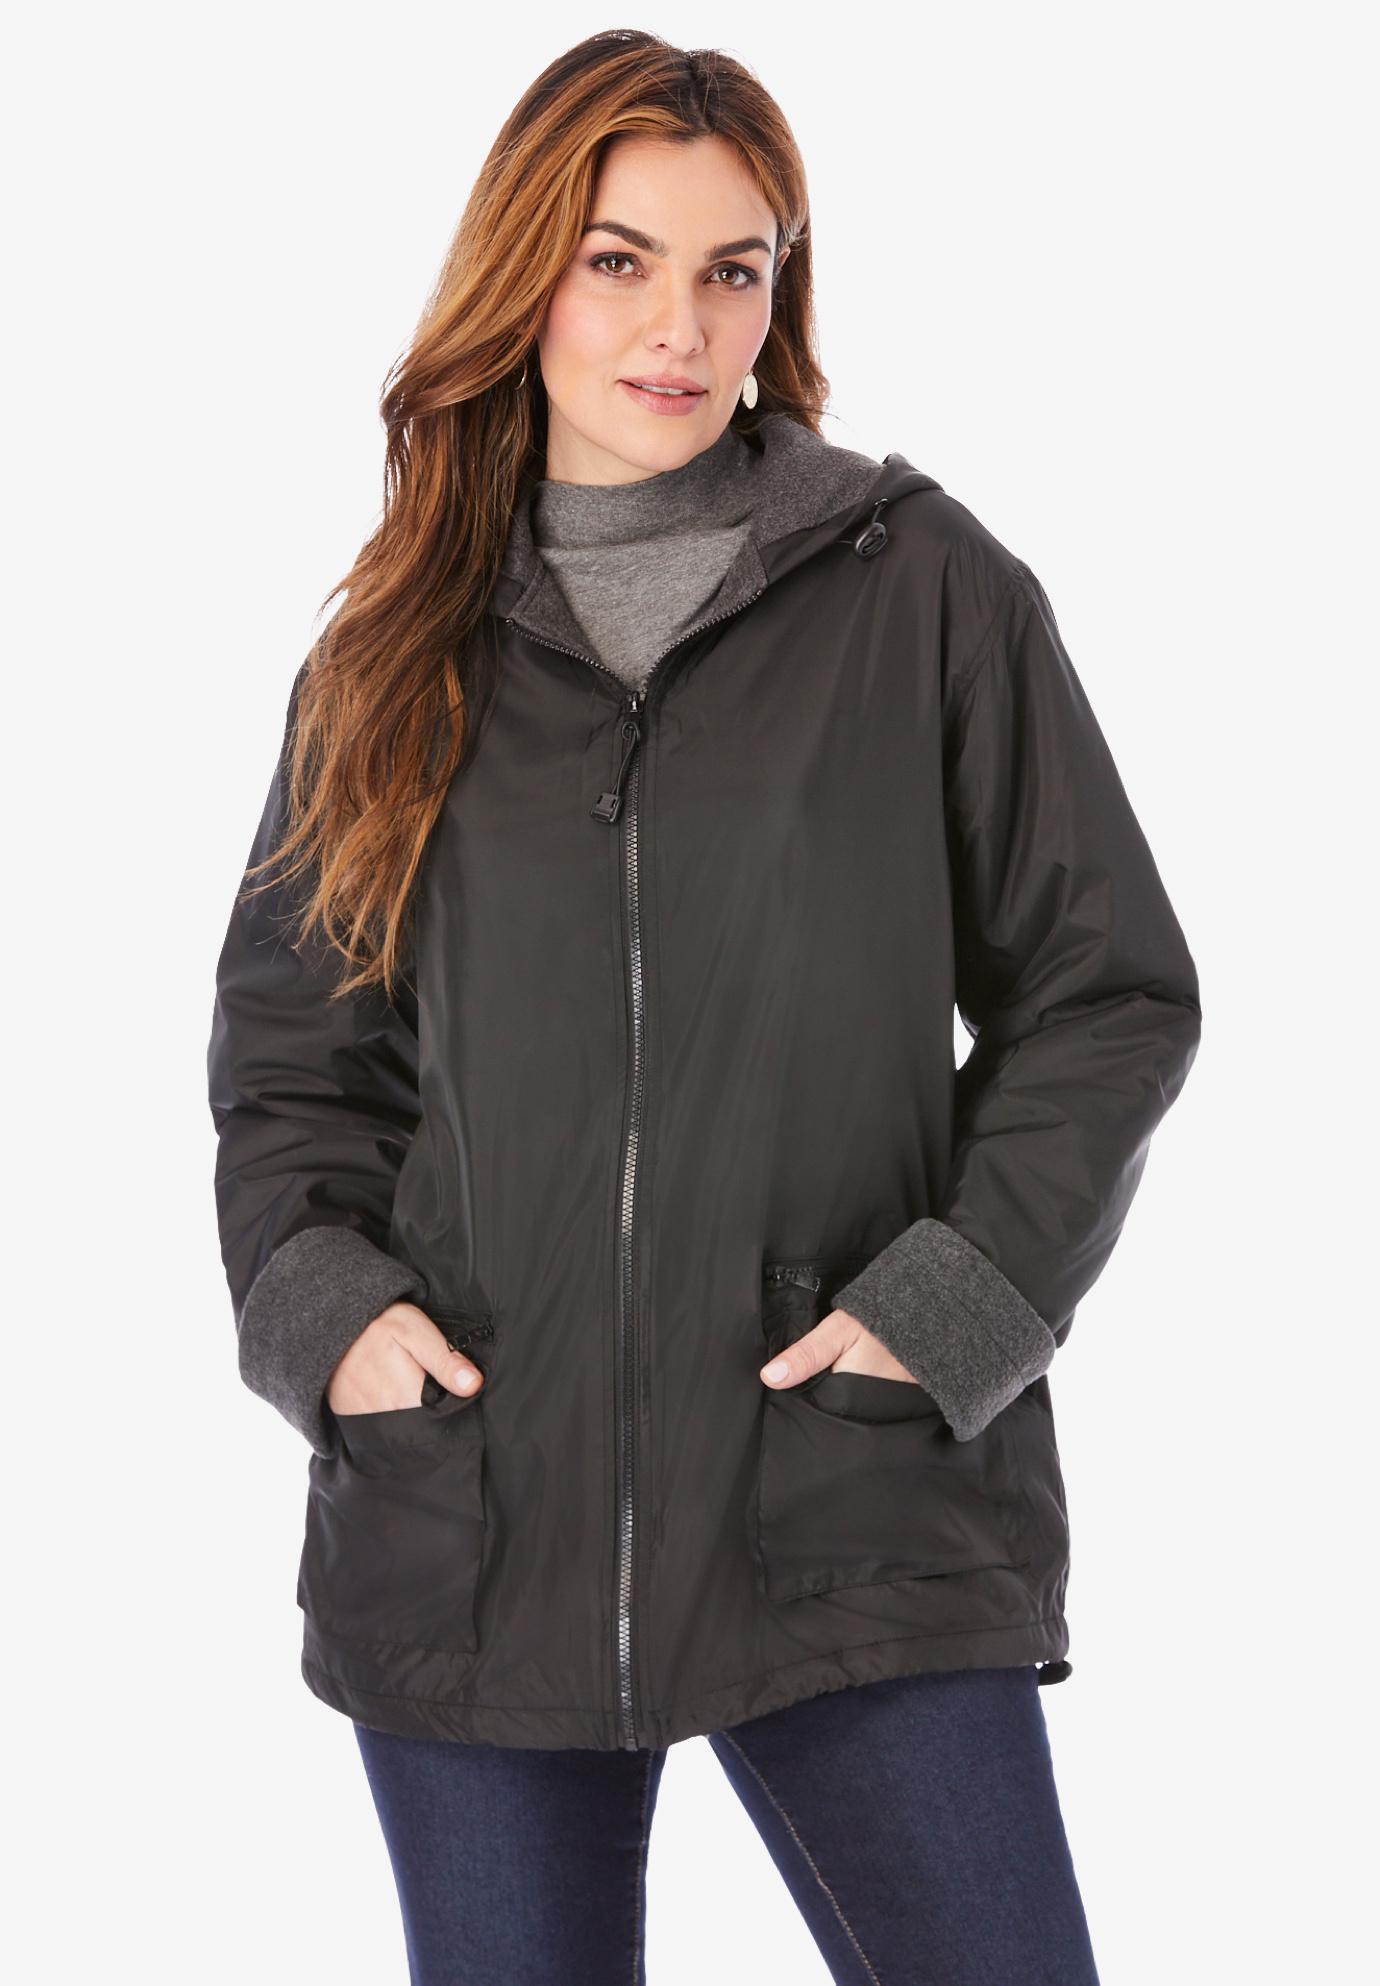 3e44a46d8eb Hooded Nylon Jacket with Fleece Lining